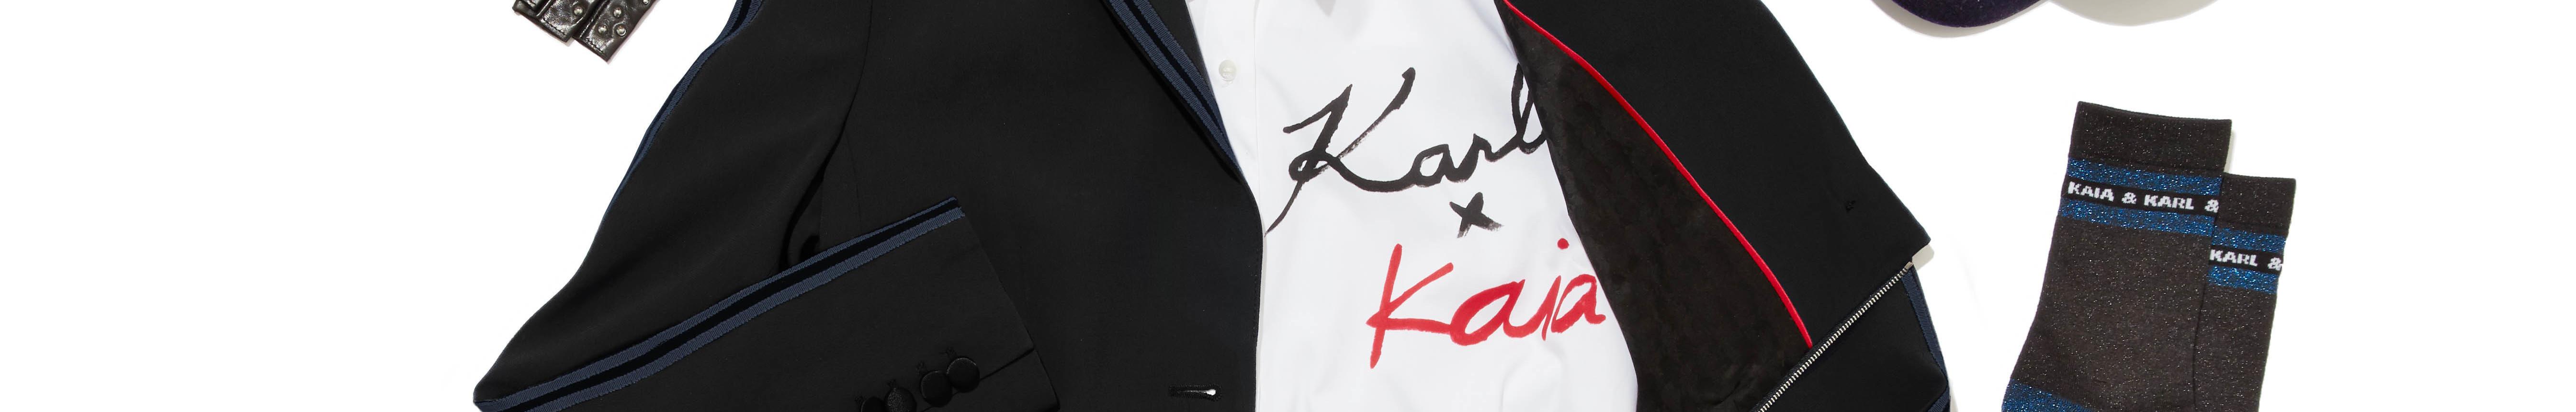 karllagerfeld视频官网 banner